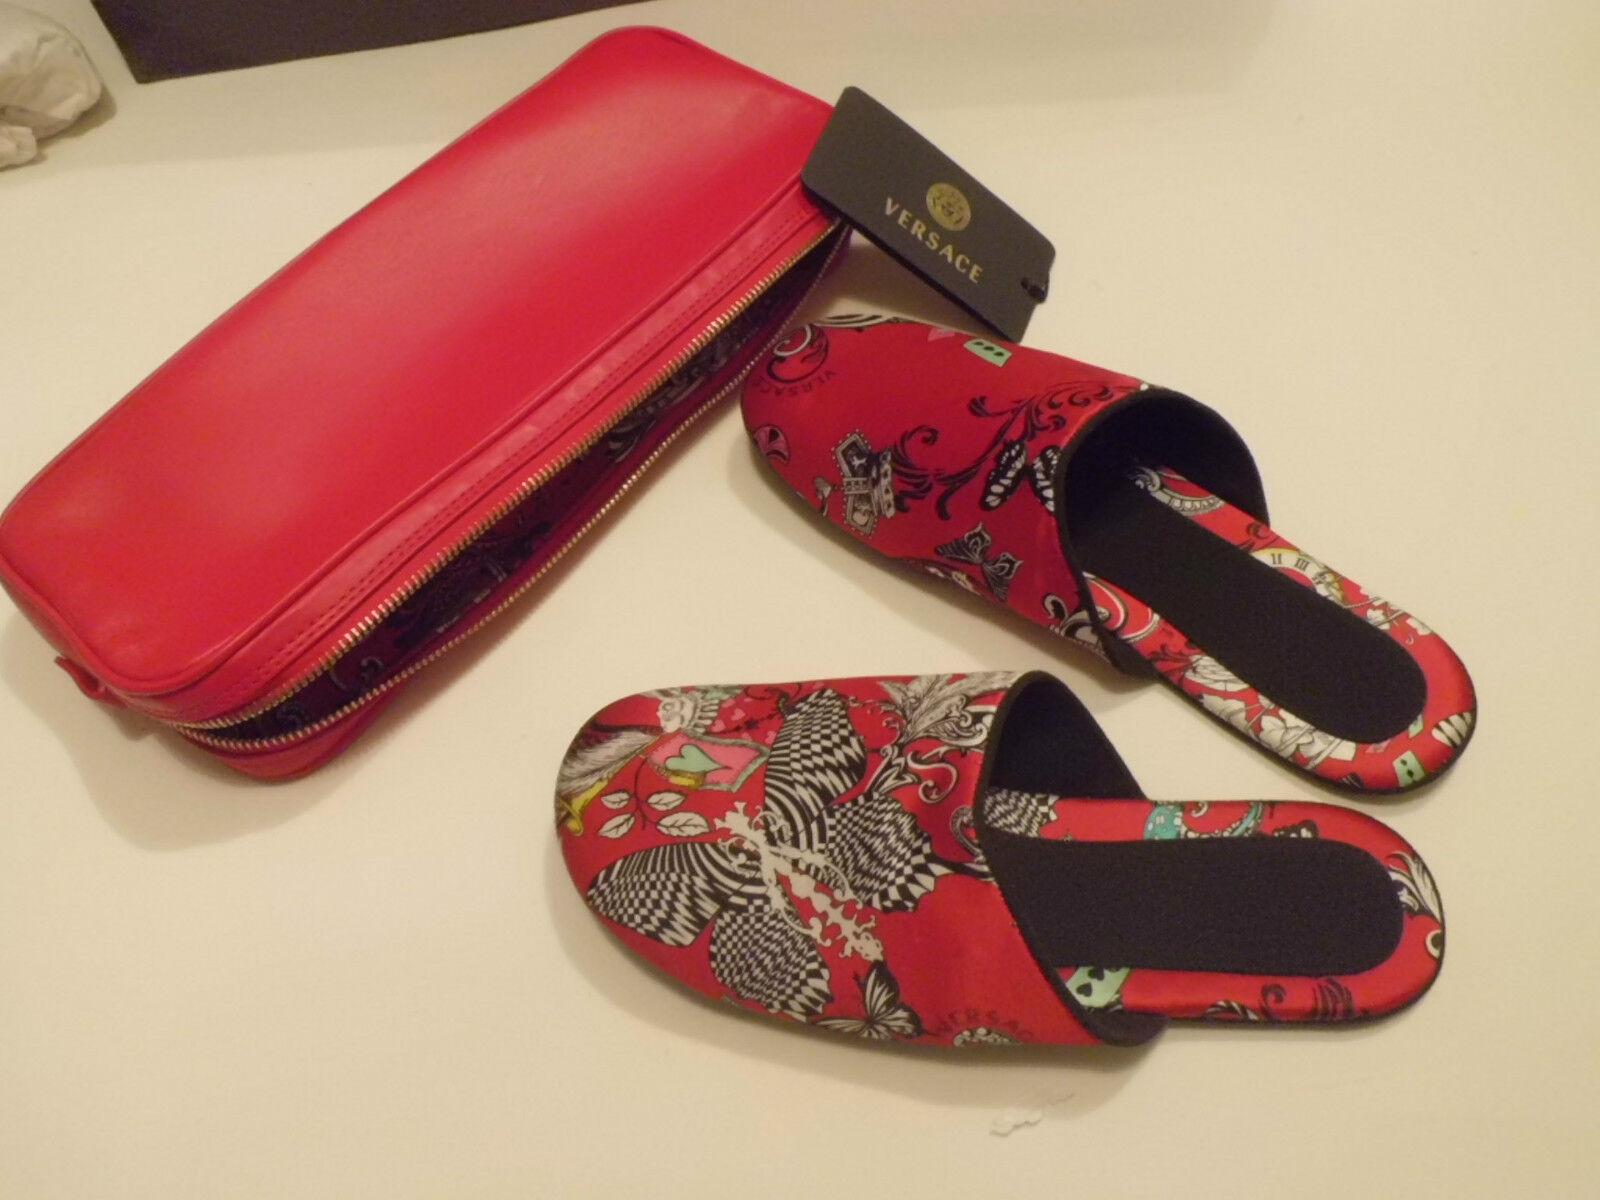 Authentic  Versace Beauty Vitello + Pantofole Pantofole Pantofole seta Tg  440,00  forma única